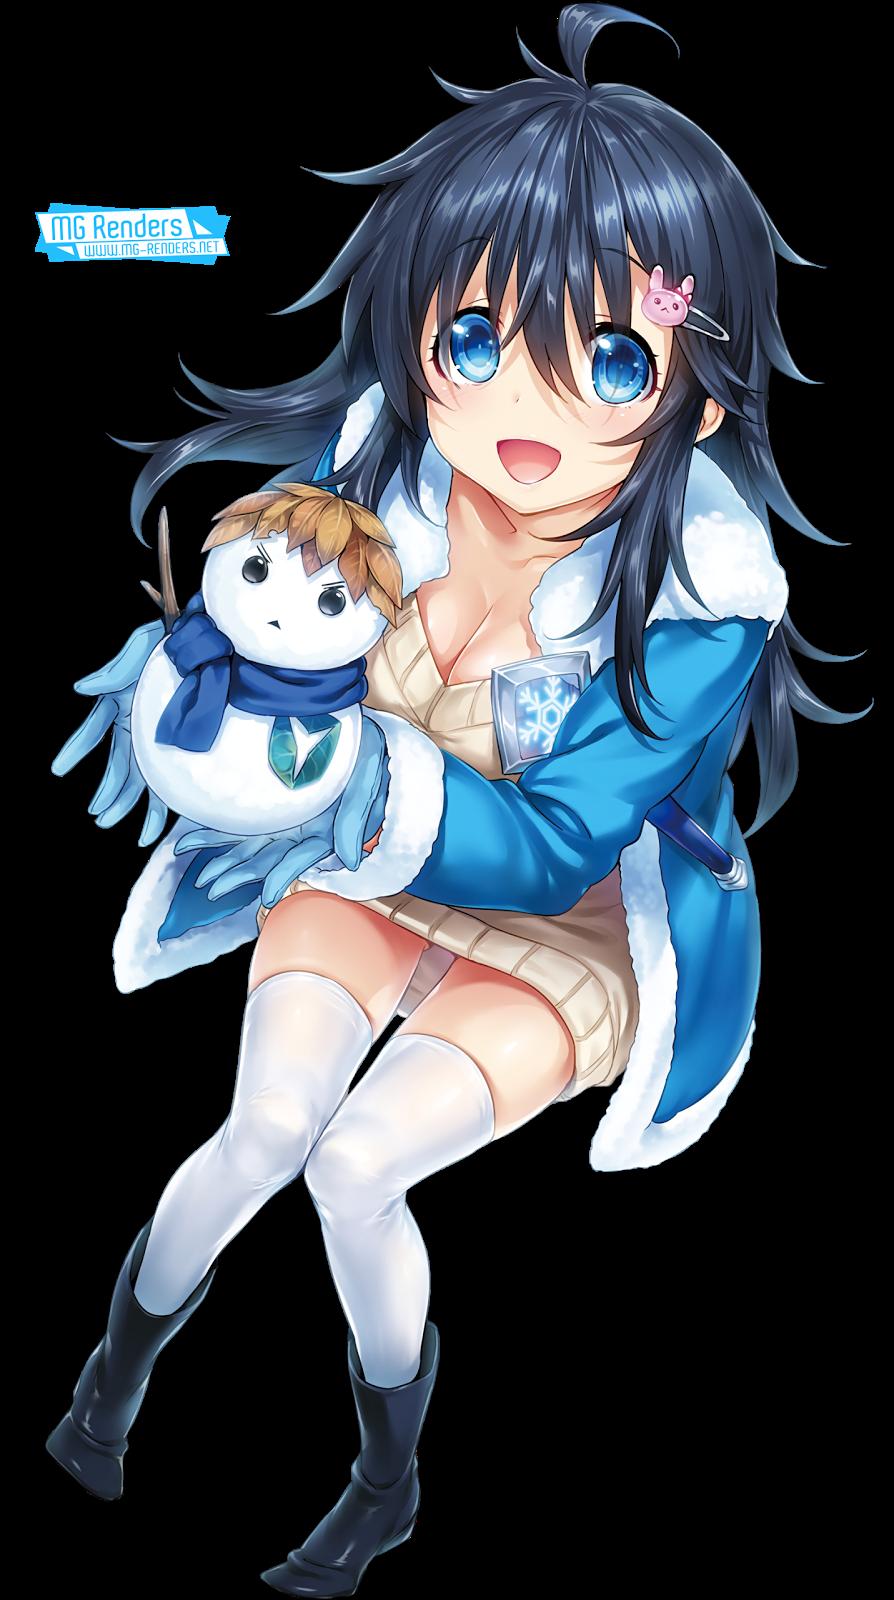 Tags: Anime, Render,  Hisasi,  Netoge no Yome wa Onnanoko ja Nai to Omotta,  Sweater,  Tamaki Ako,  PNG, Image, Picture